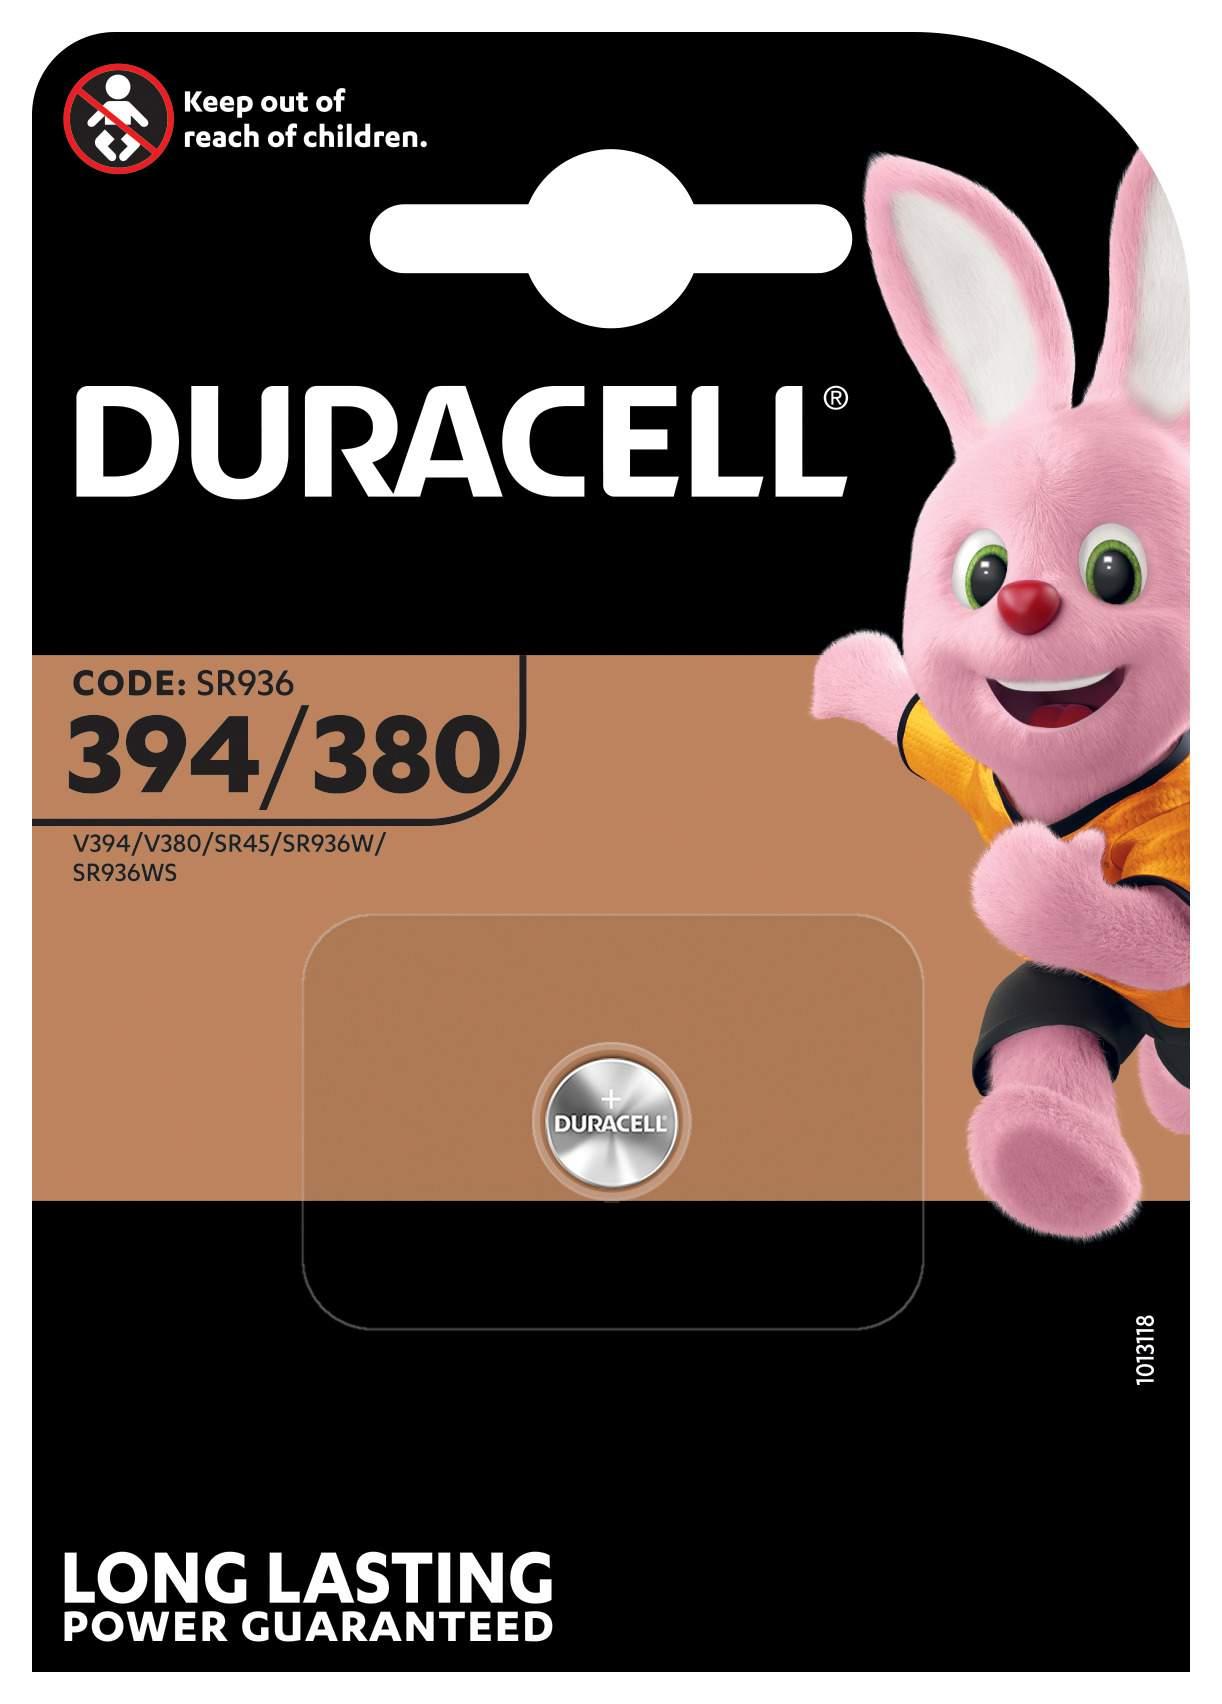 Duracell Pile 394 / 380 / SR936 / SR45 Duracell Montre